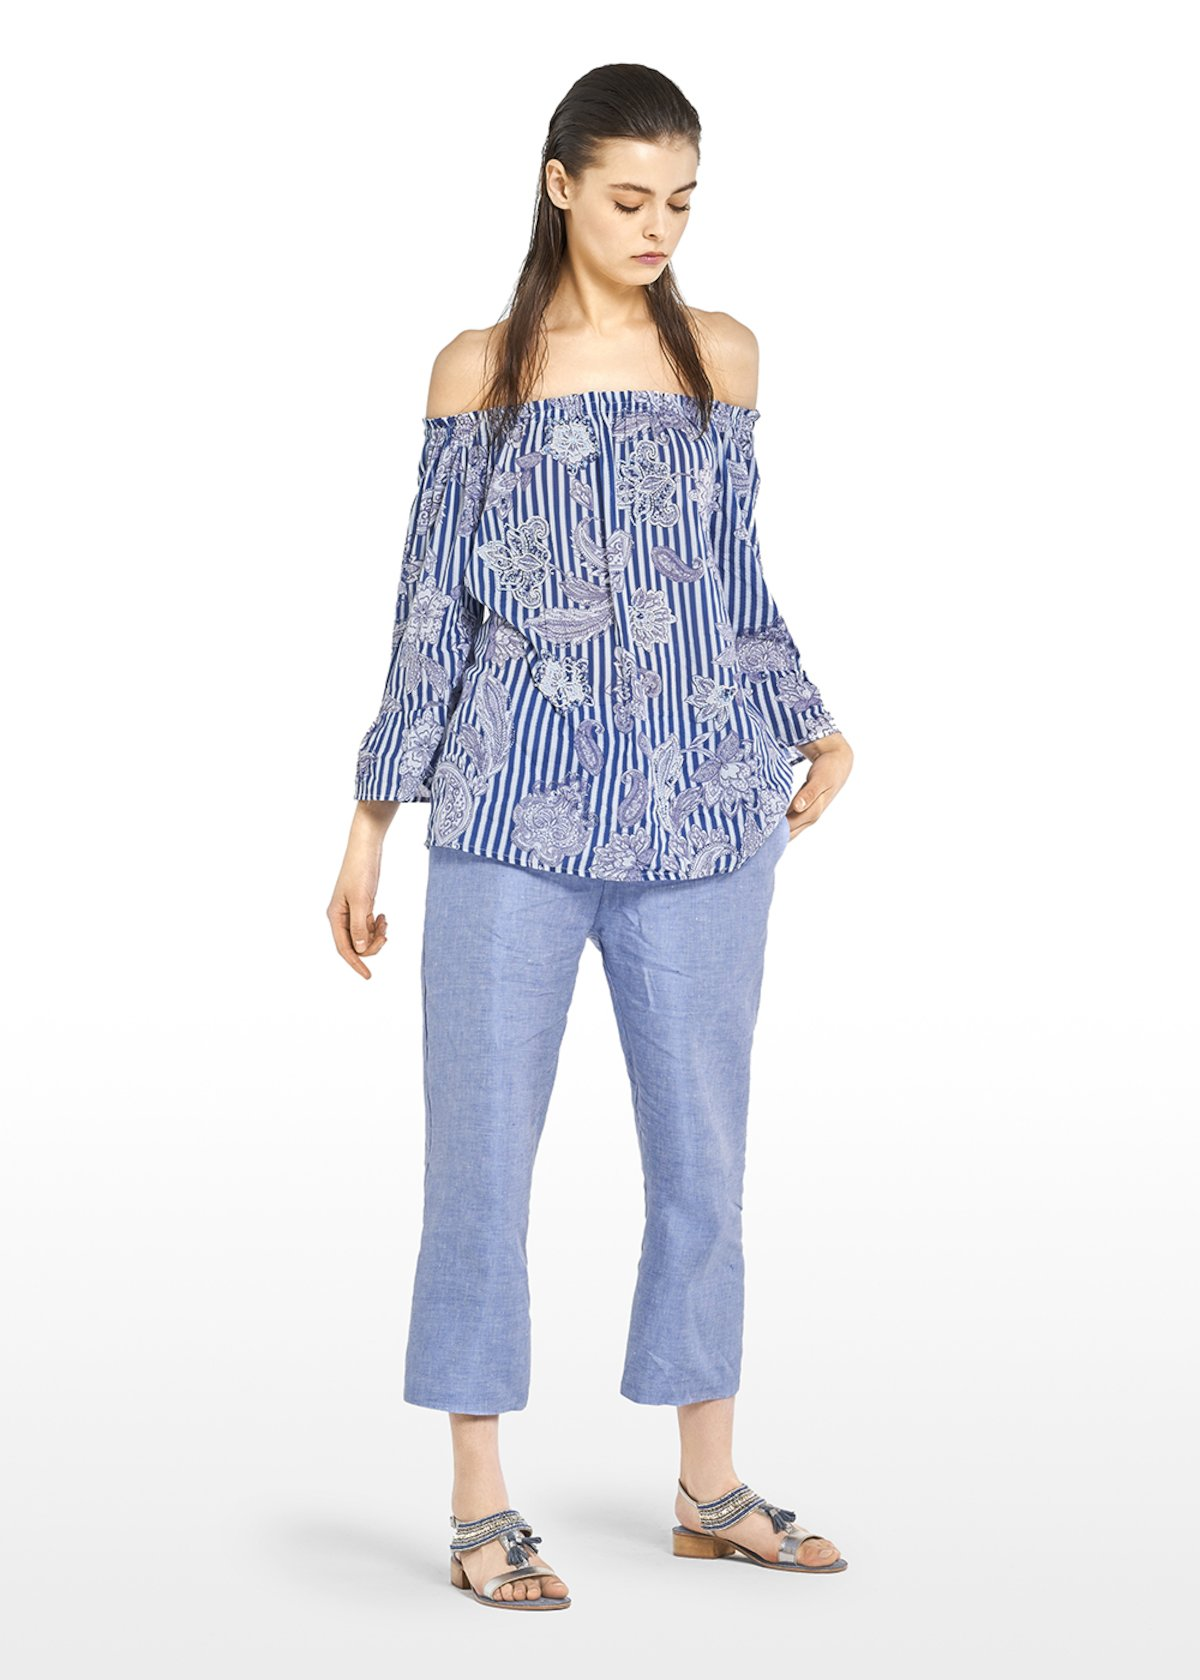 Clodi blouse in cotton with off-shoulder neckline